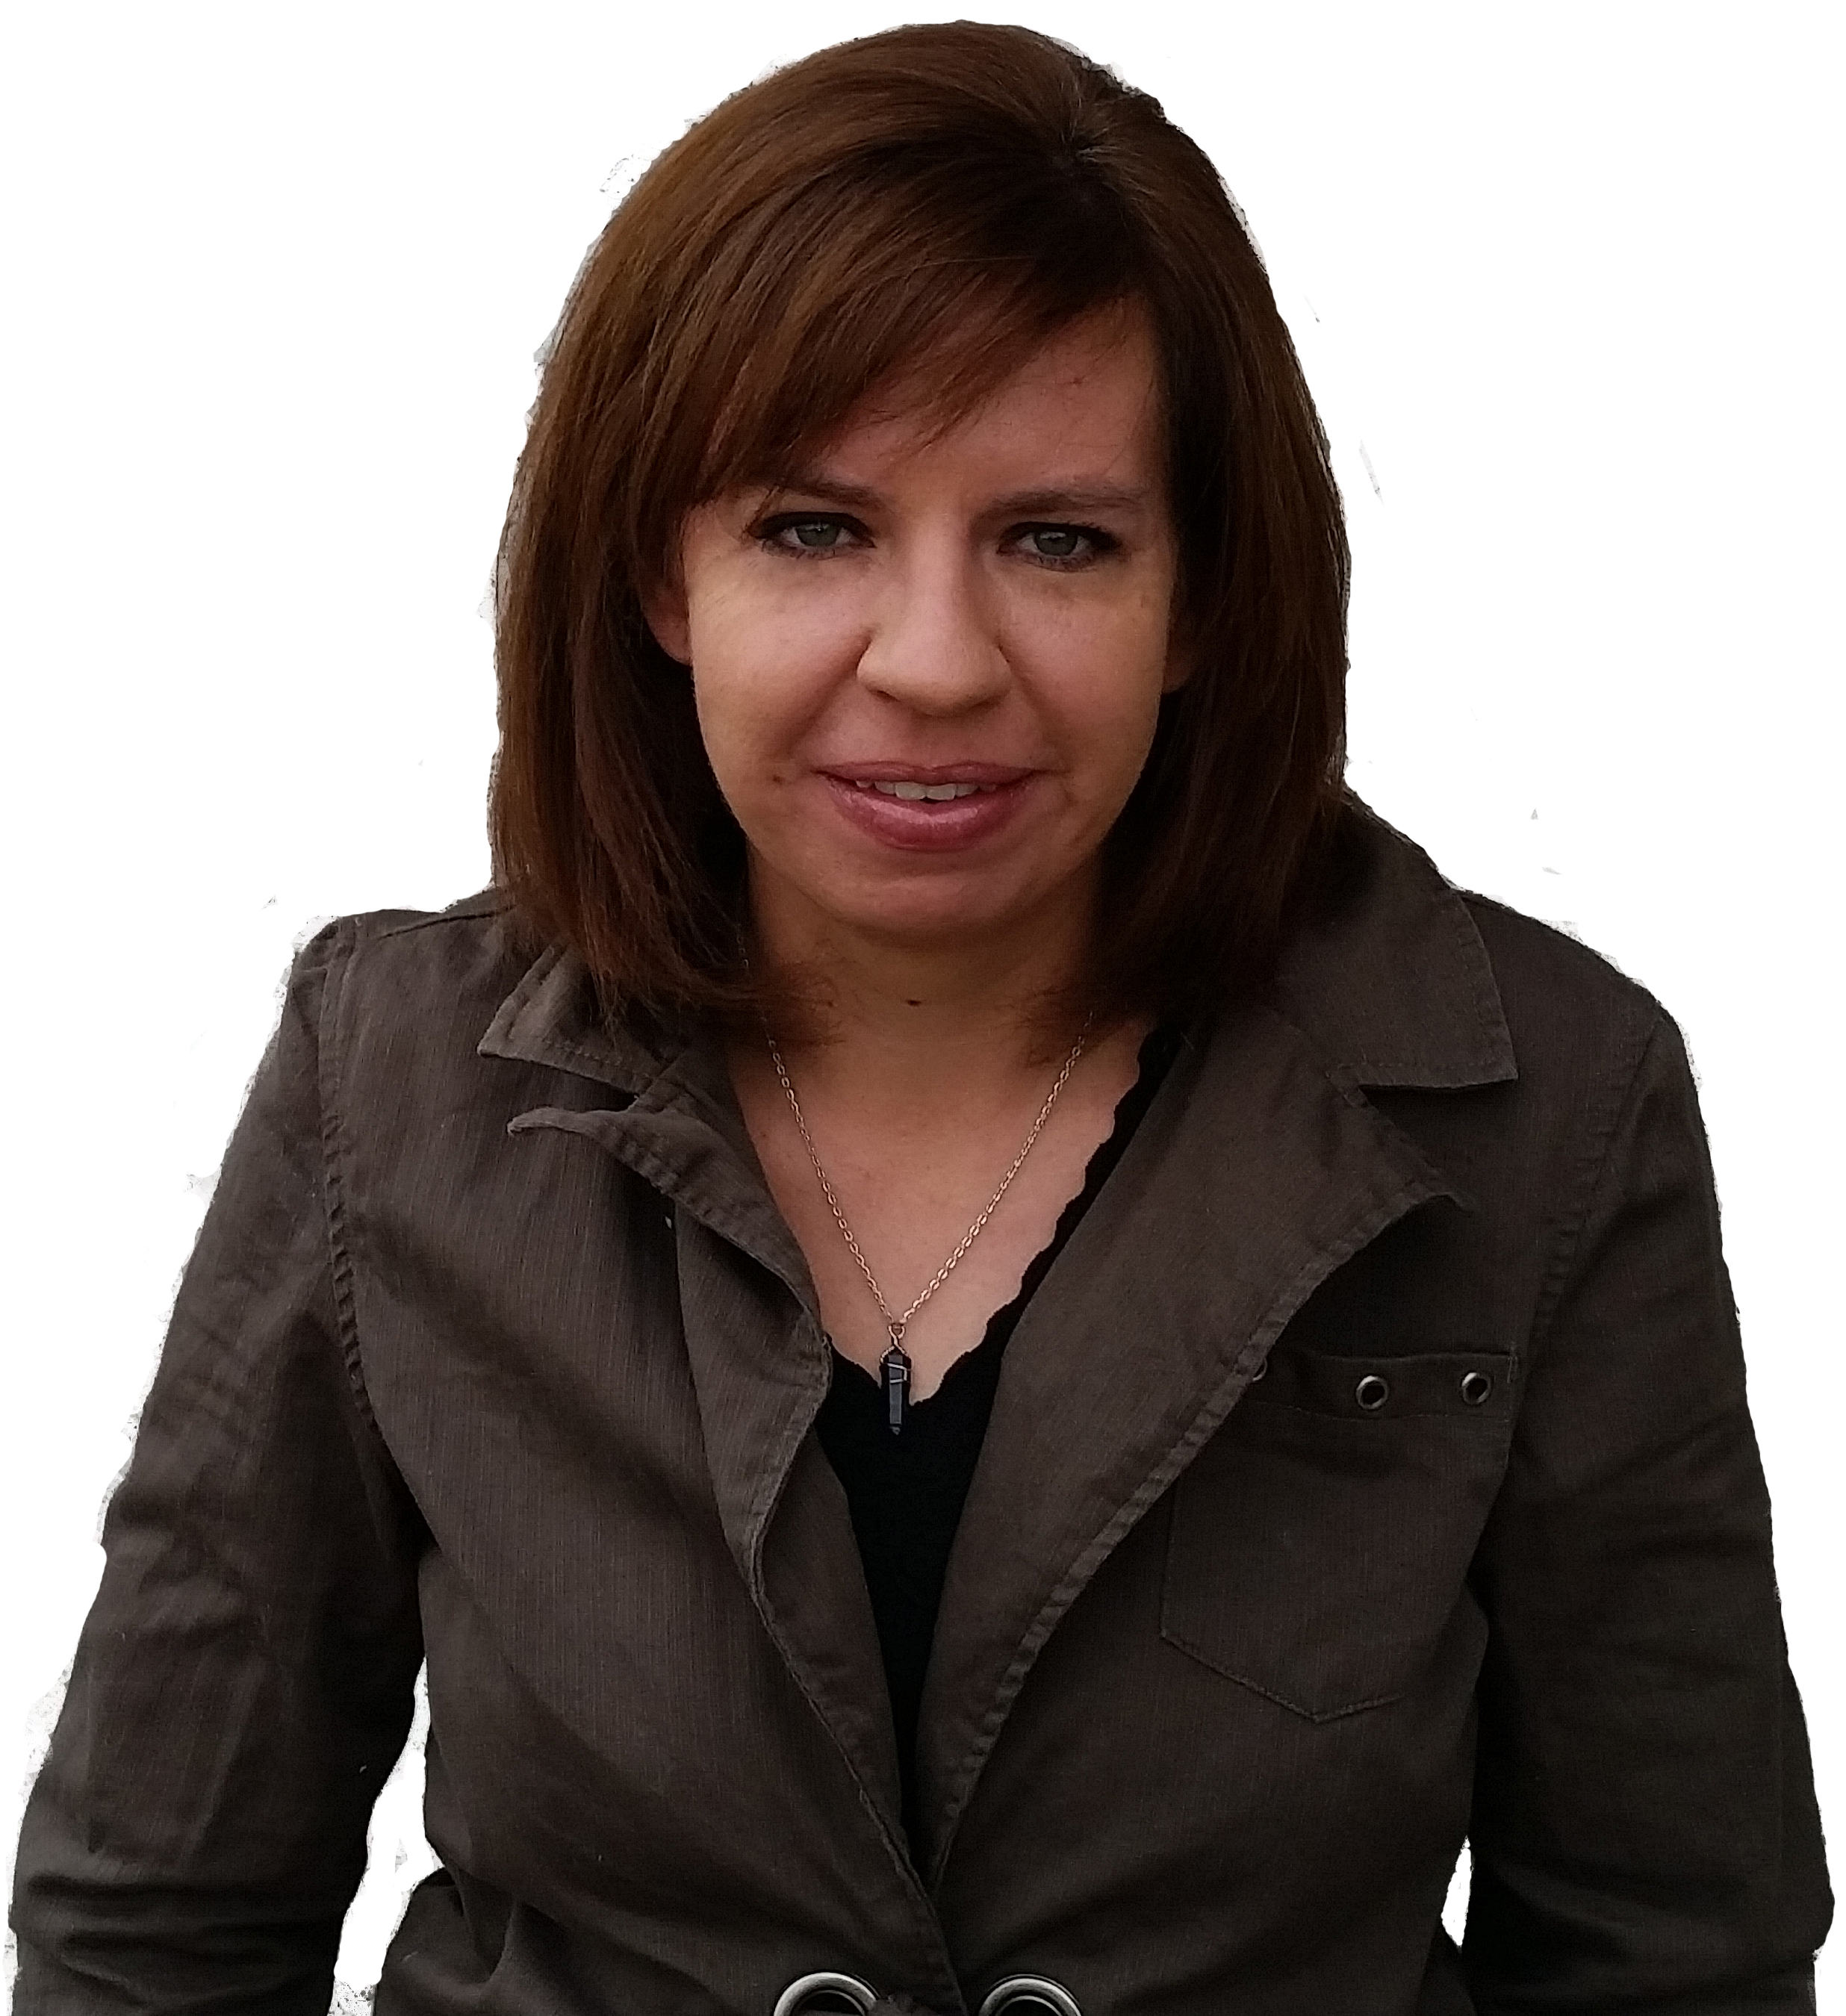 Sally Horrocks